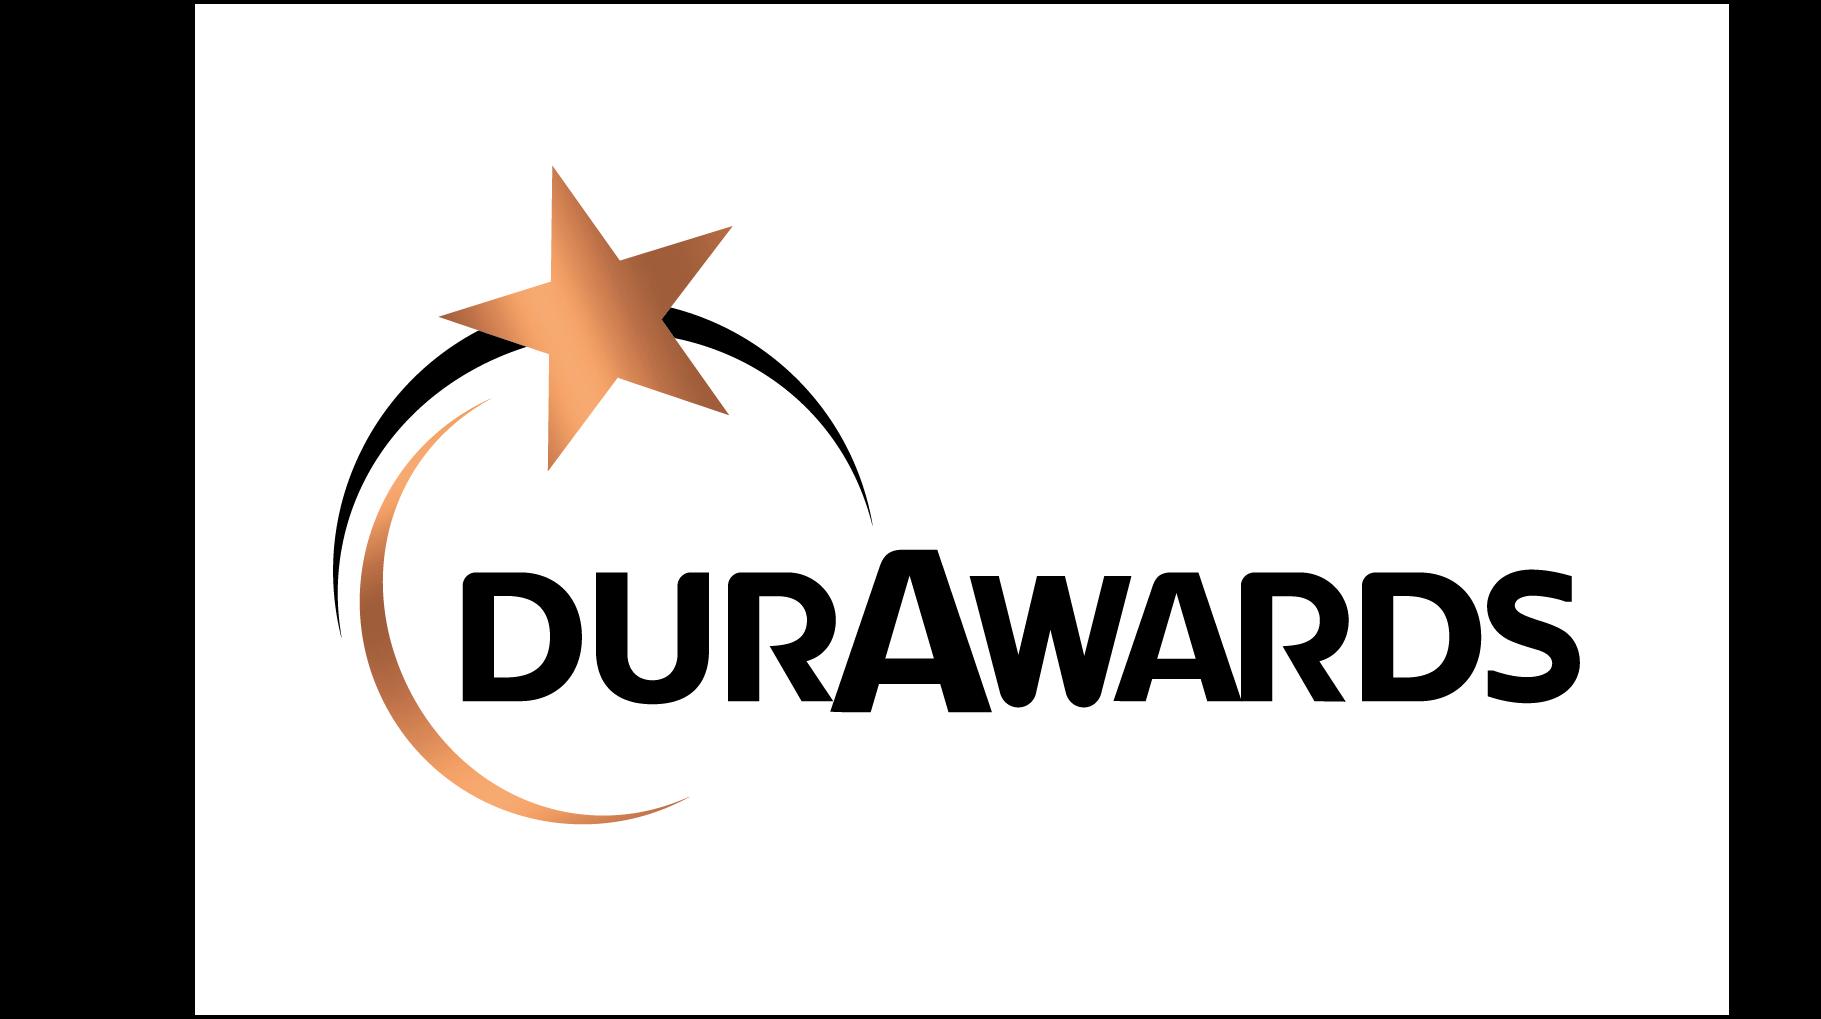 Durawards-logo1-final-01